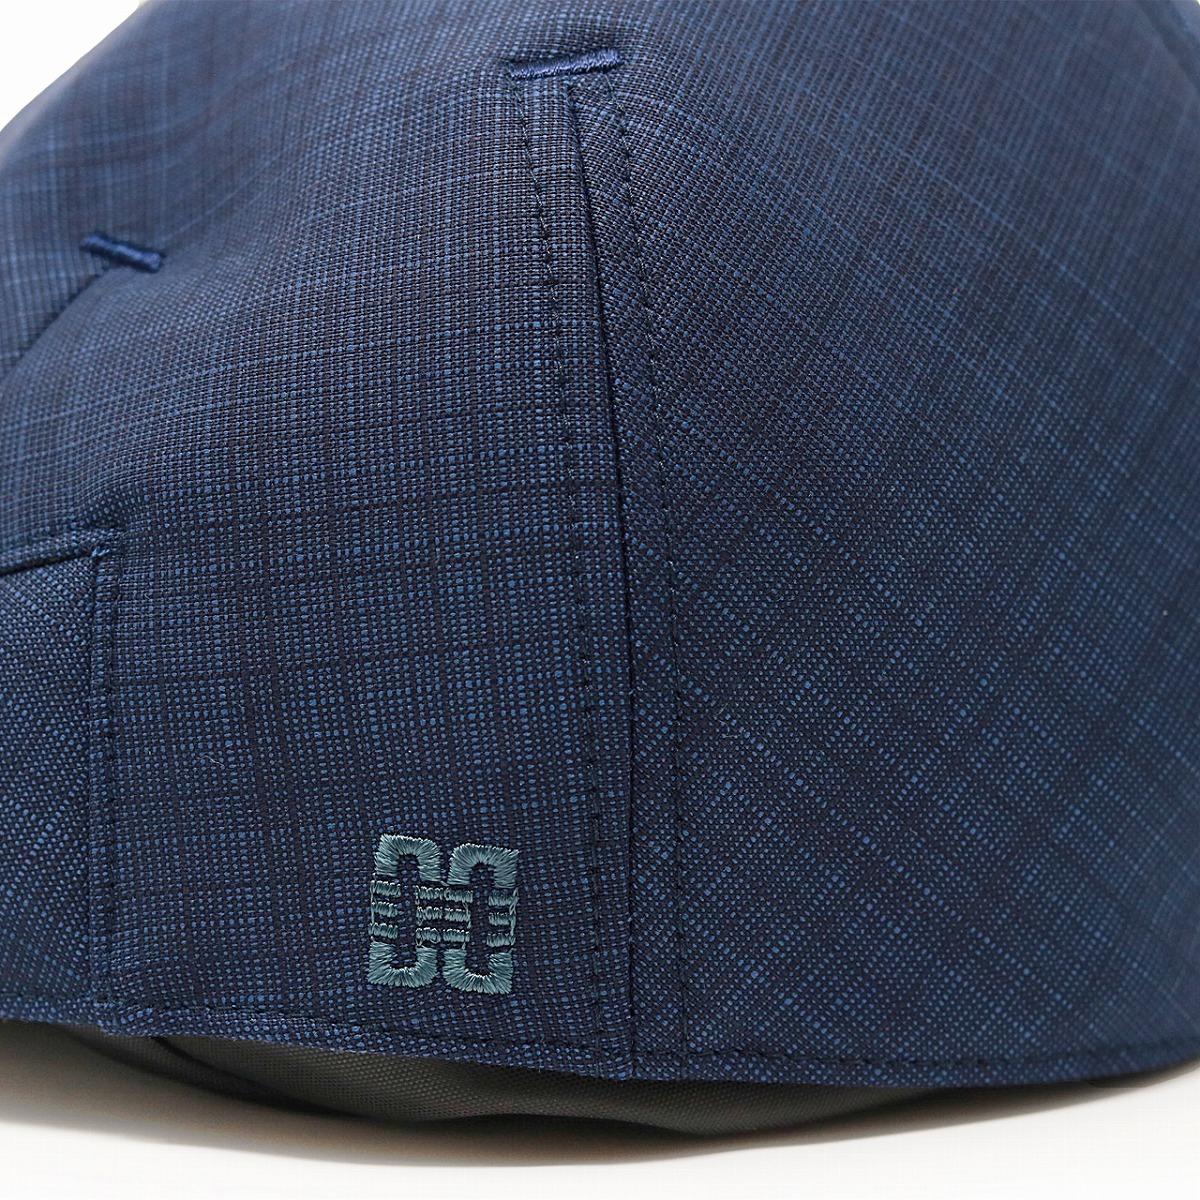 9b993a34e3e It is a gift present in natural fiber Shin pull plain fabric daks hunting cap  hat gentleman big size S M L LL hunting cap hat unisex Monaco hunting cap  ...